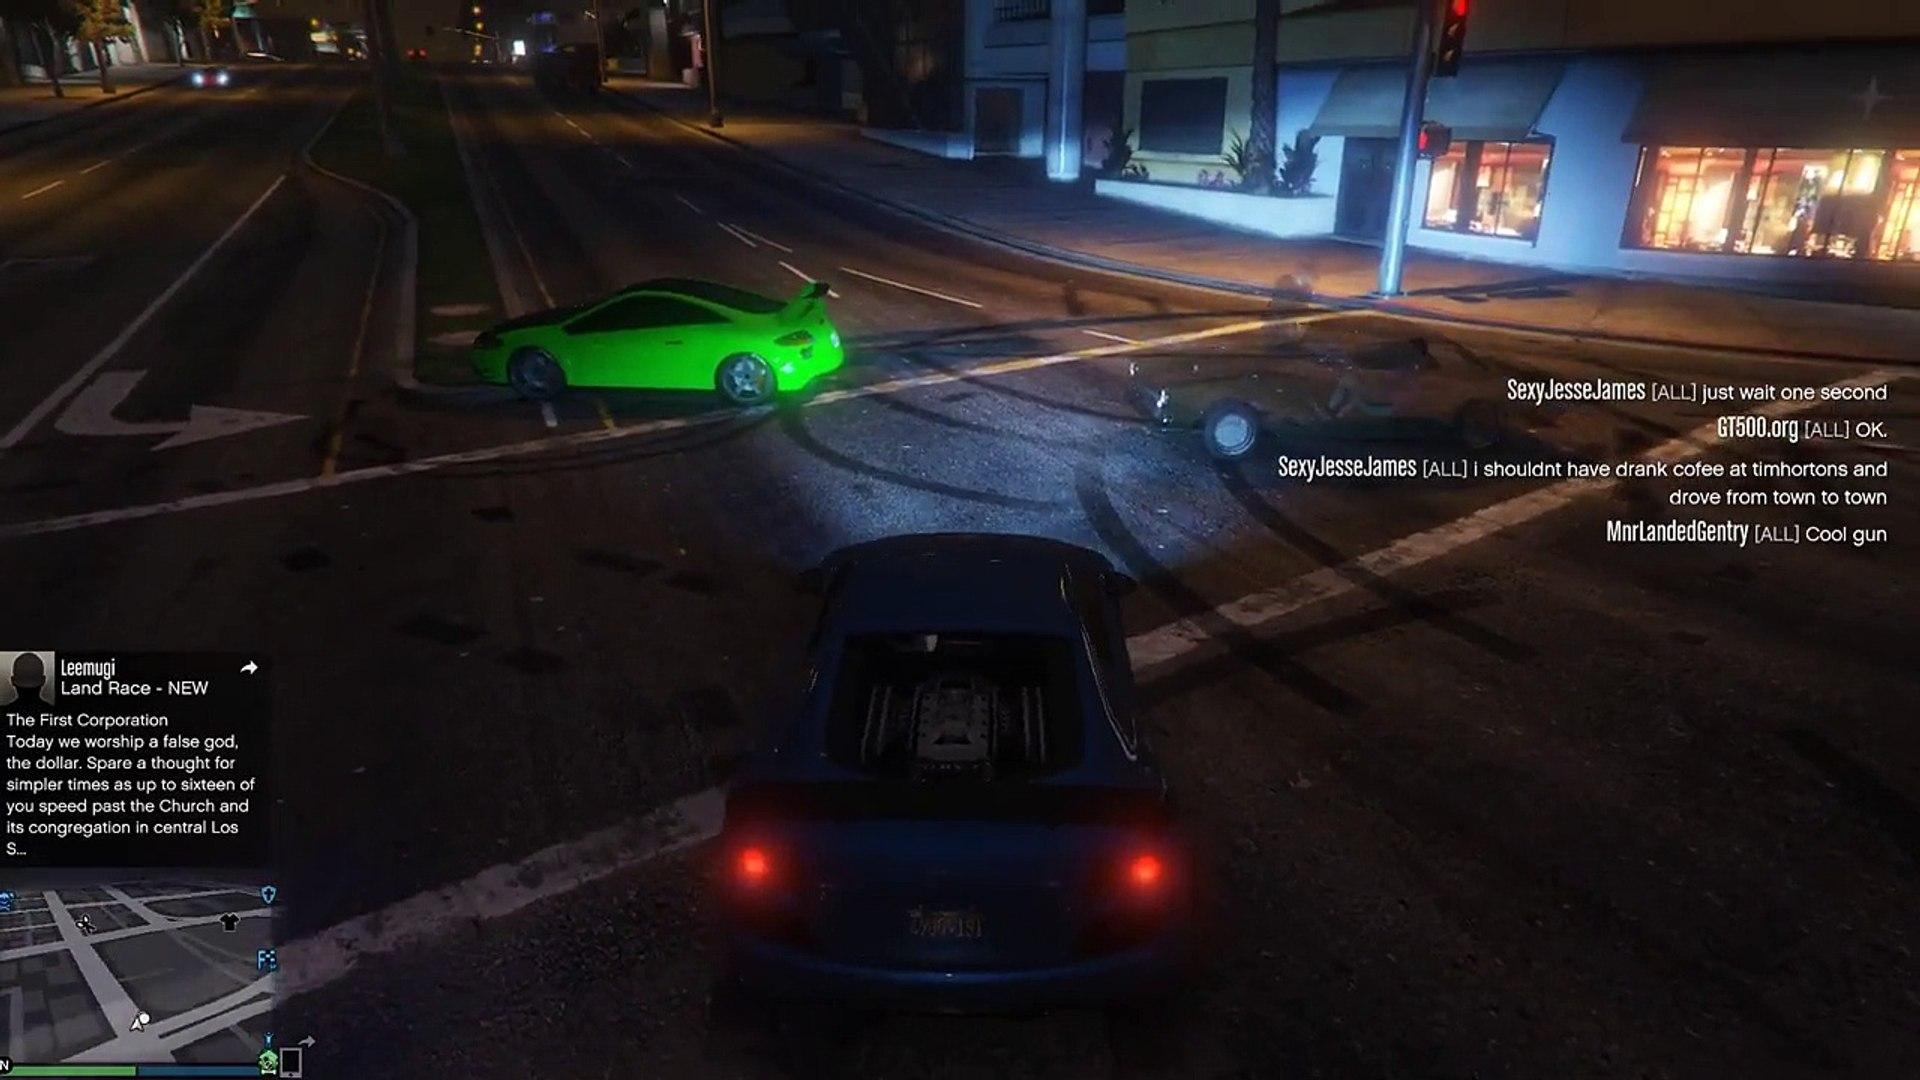 GTA V (PC) Online - Cheater/Script Kiddie Spawning Money, Super Jumping, Etc.